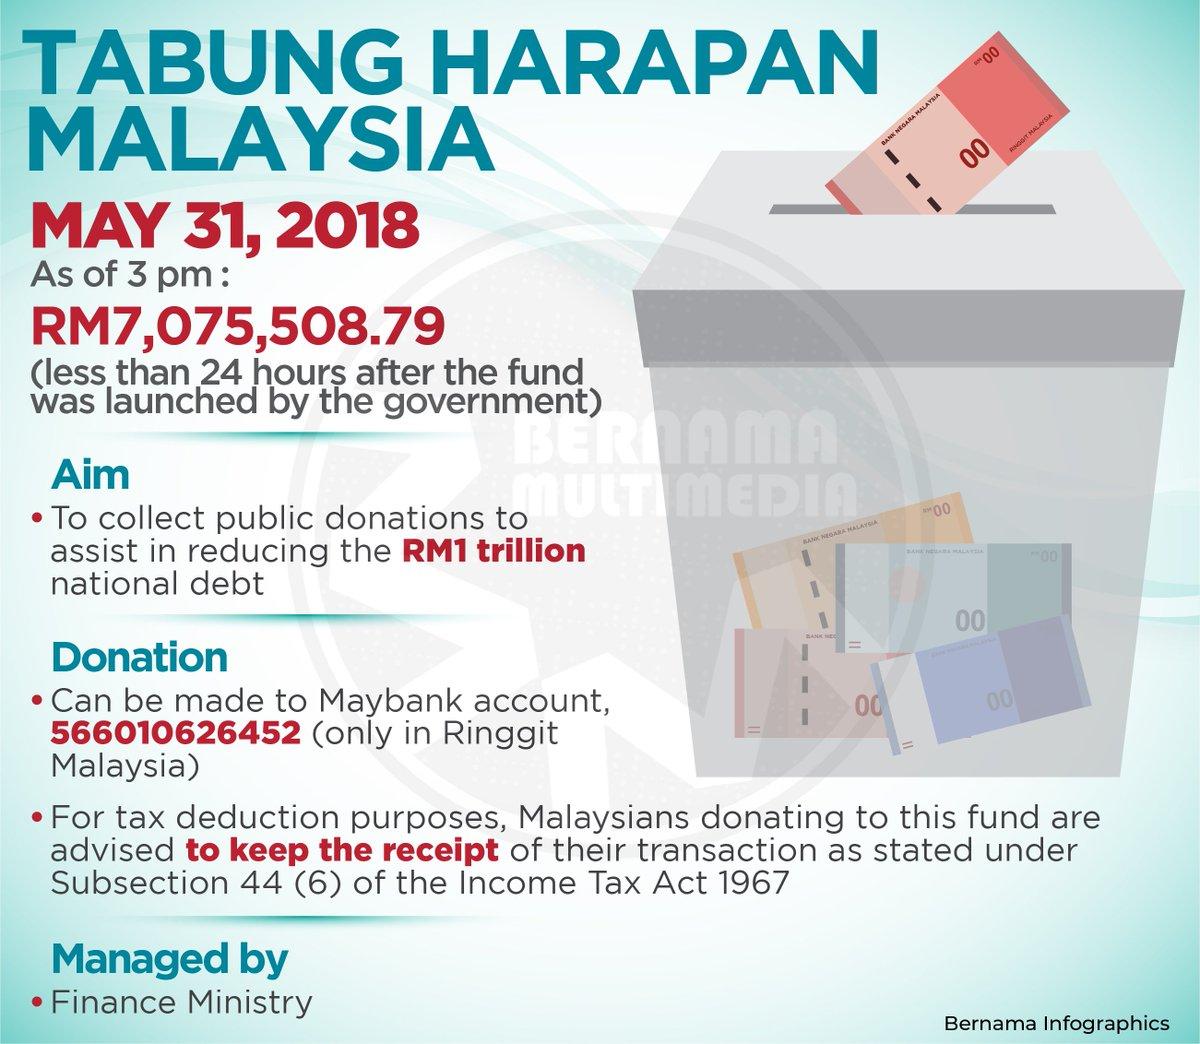 Bernama On Twitter Infographic Tabung Harapan Malaysia As Of May 31 2018